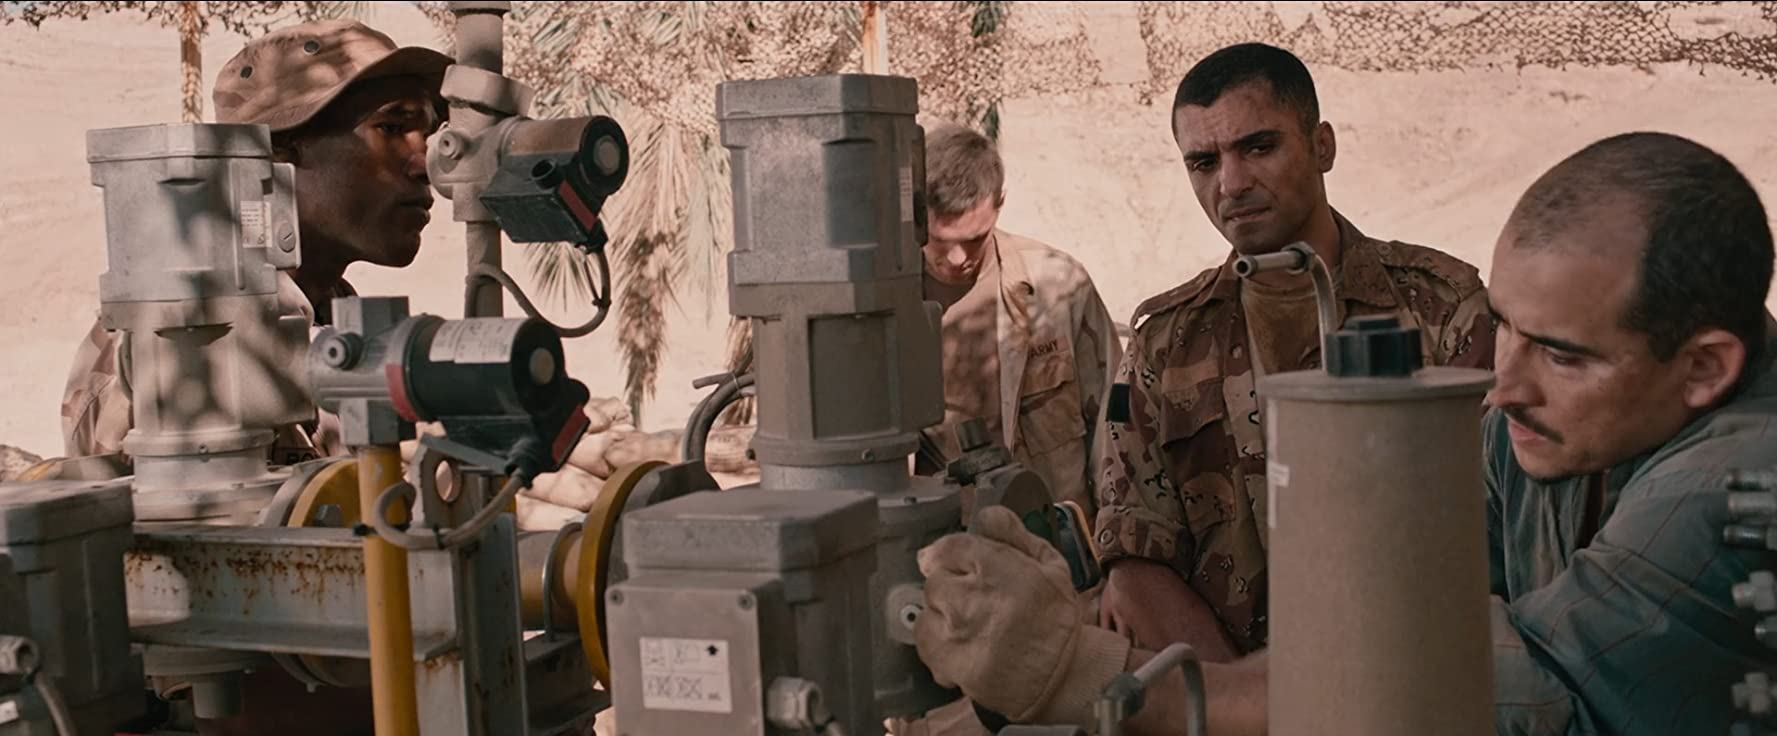 FILM - Sand Castle (2017)